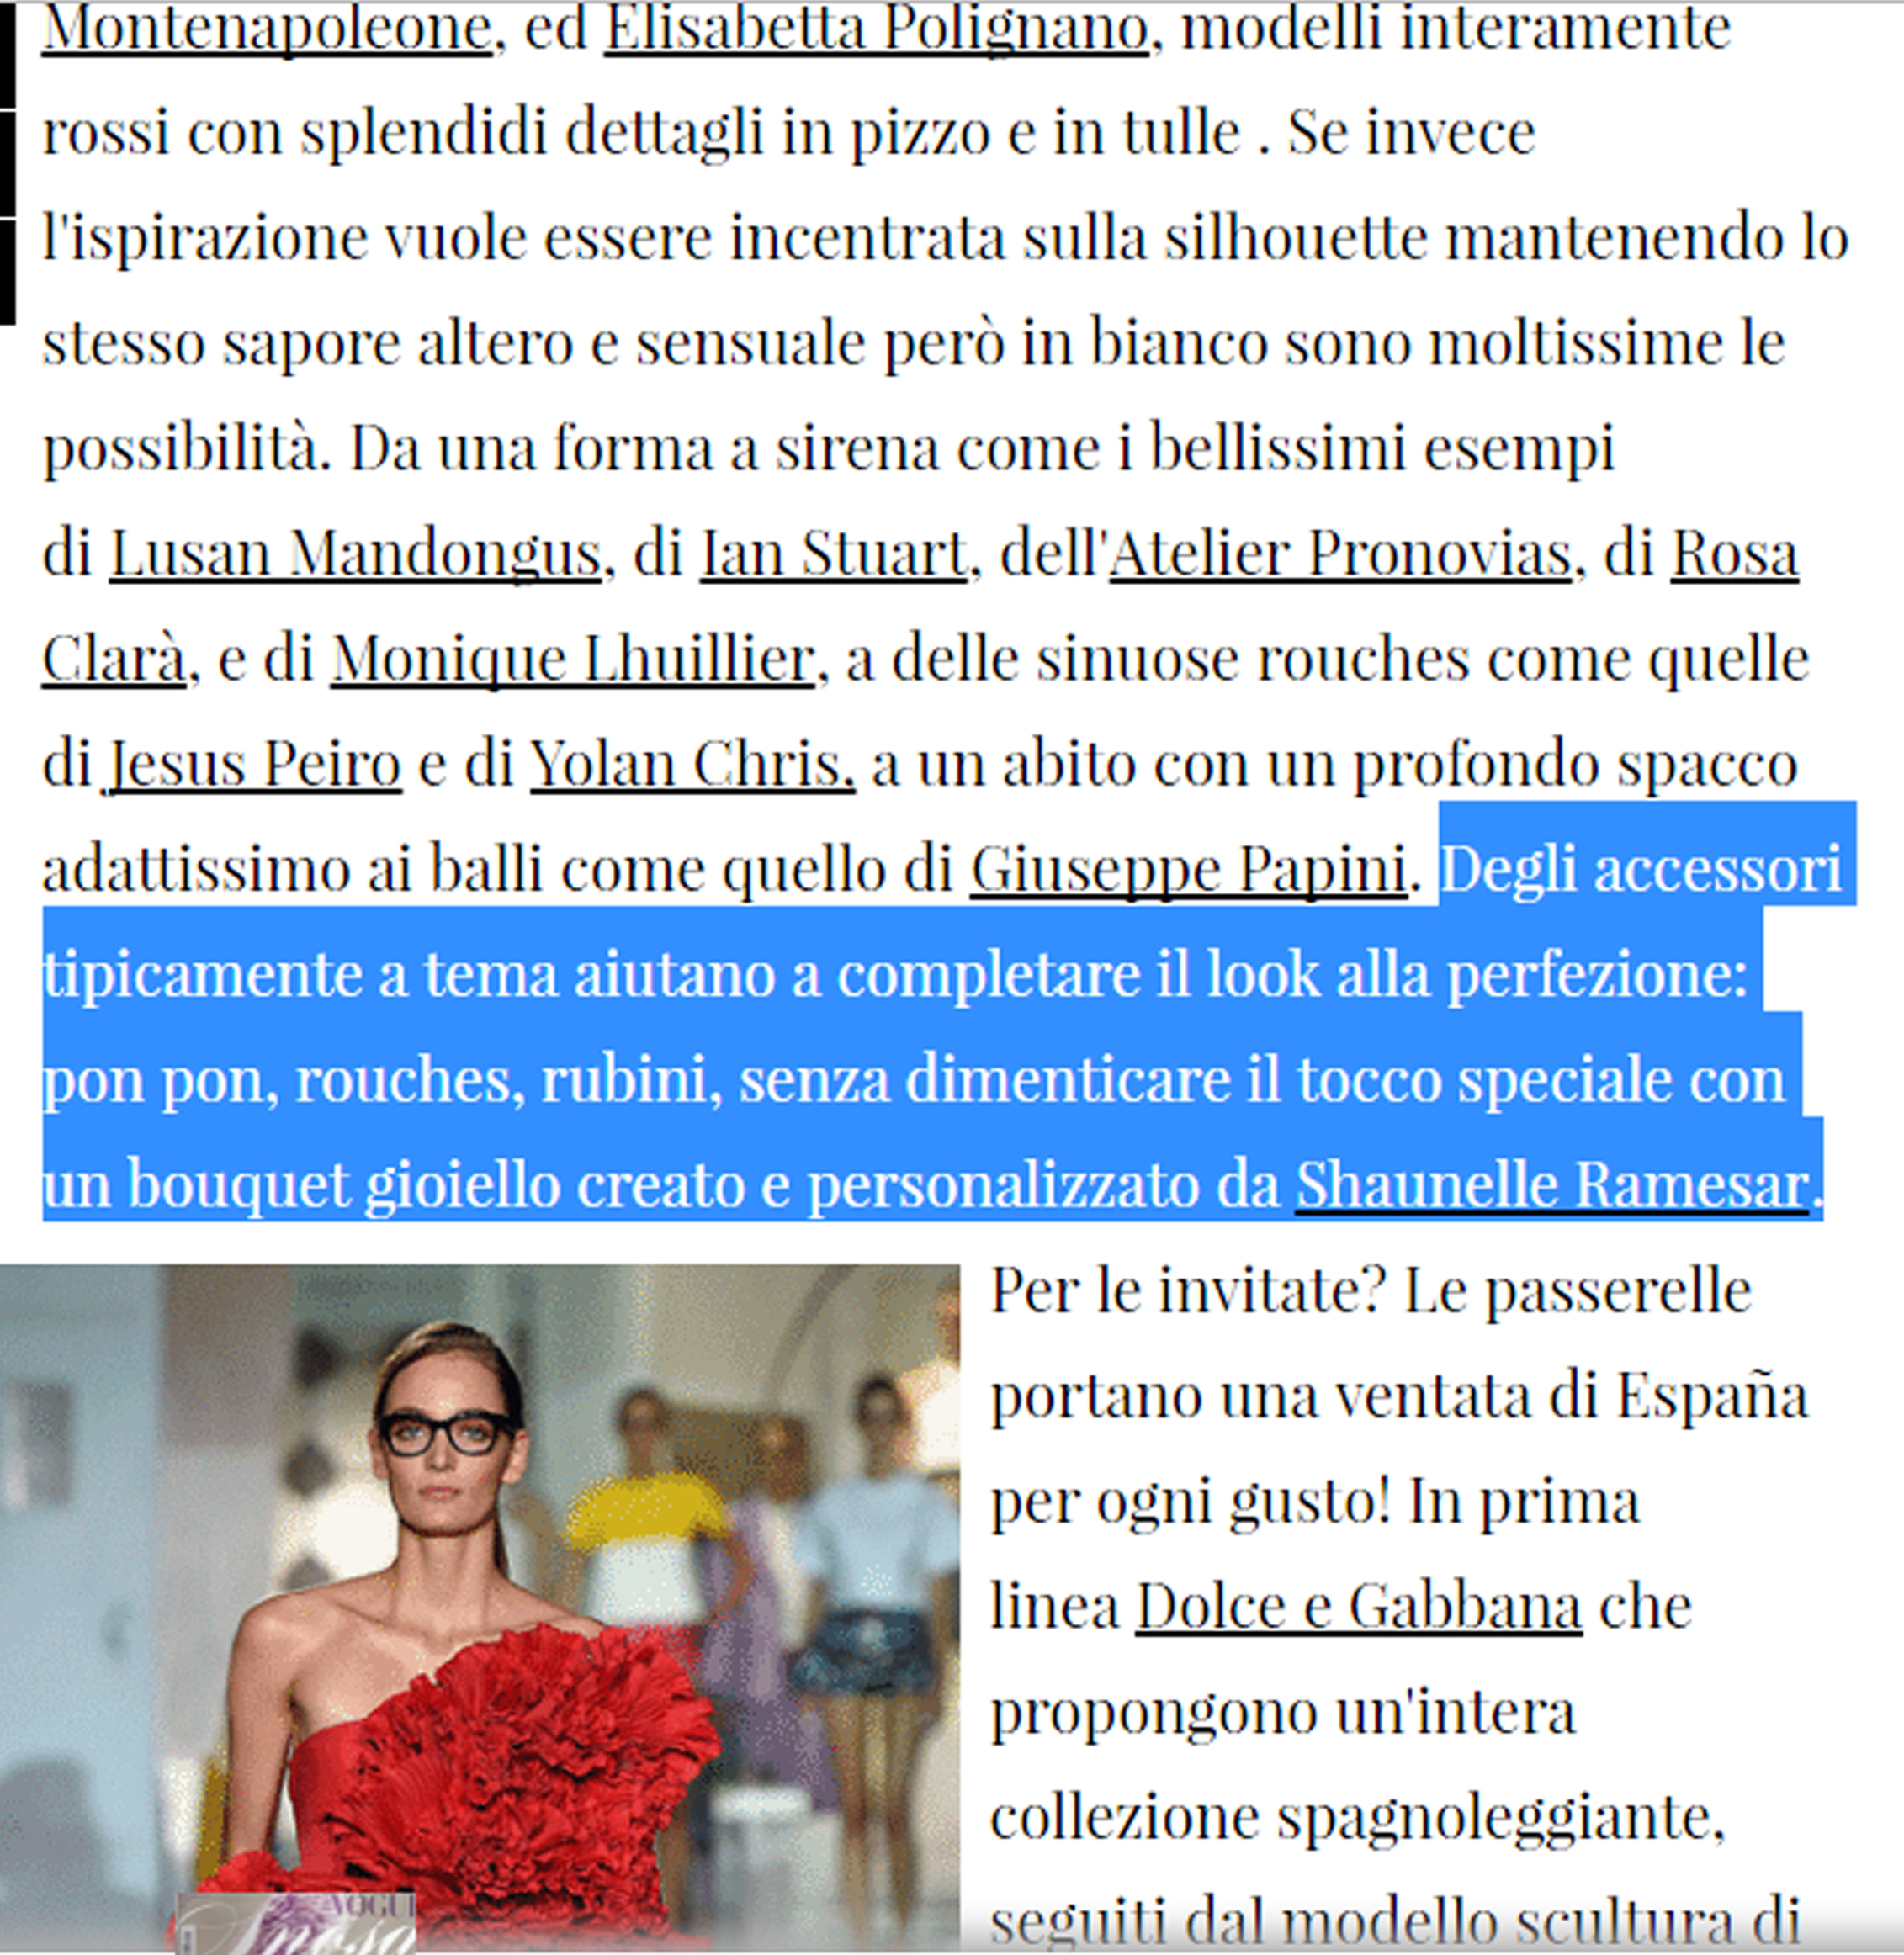 Vogue Sposa Blog post 2.jpg